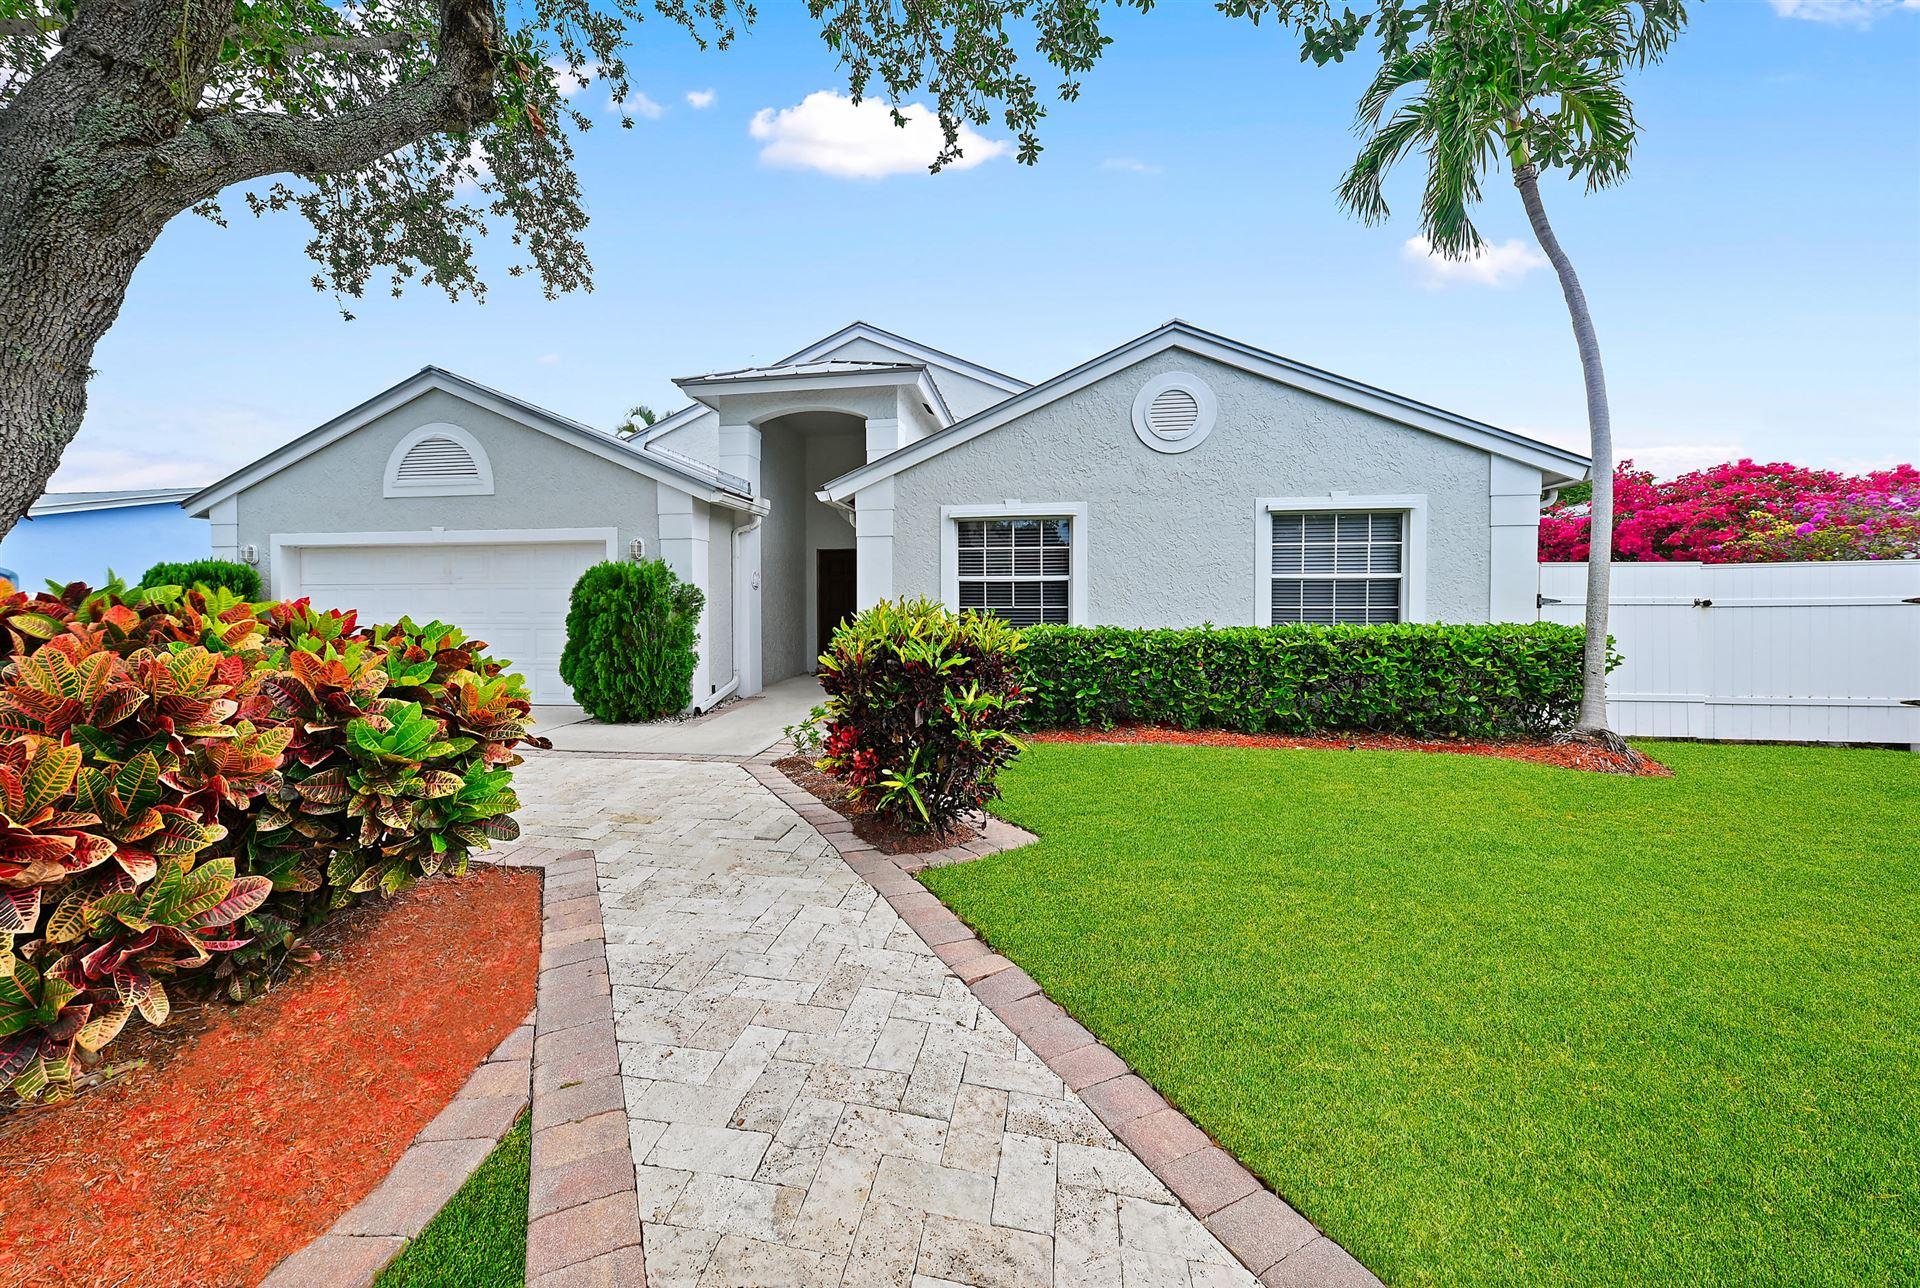 333 NW 6th Avenue, Boca Raton, FL 33432 - MLS#: RX-10715335